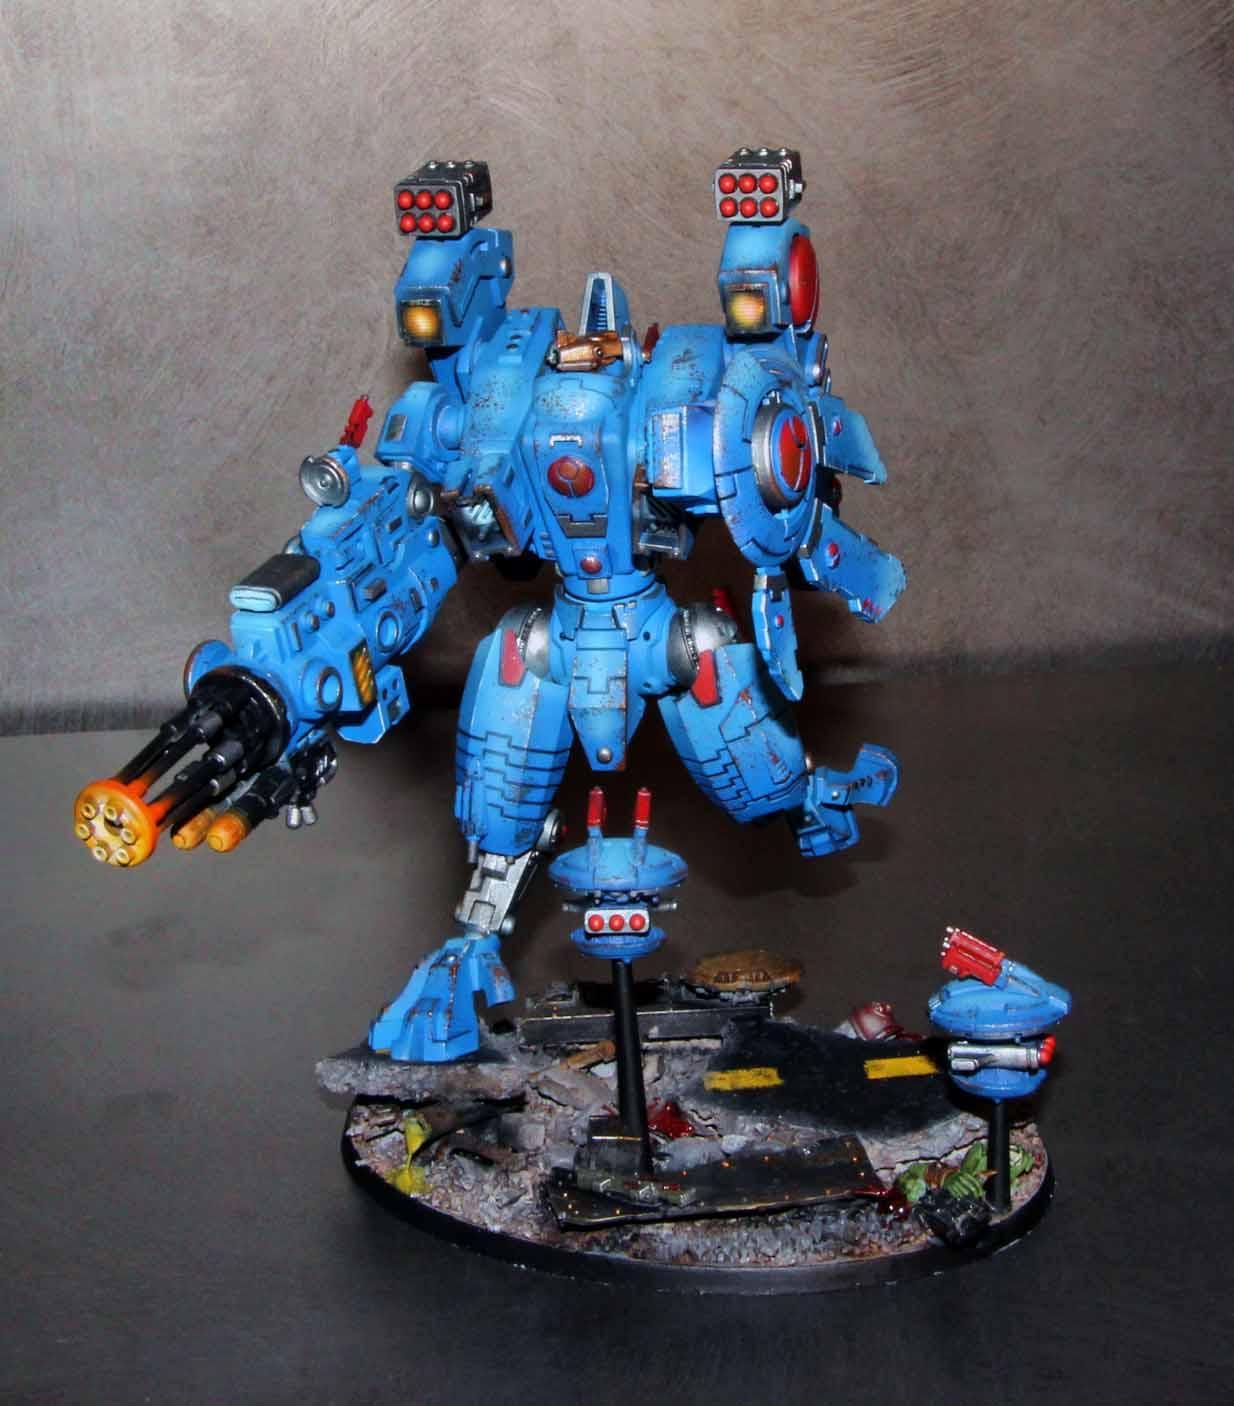 Riptide, Warhammer 40,000, Xv104